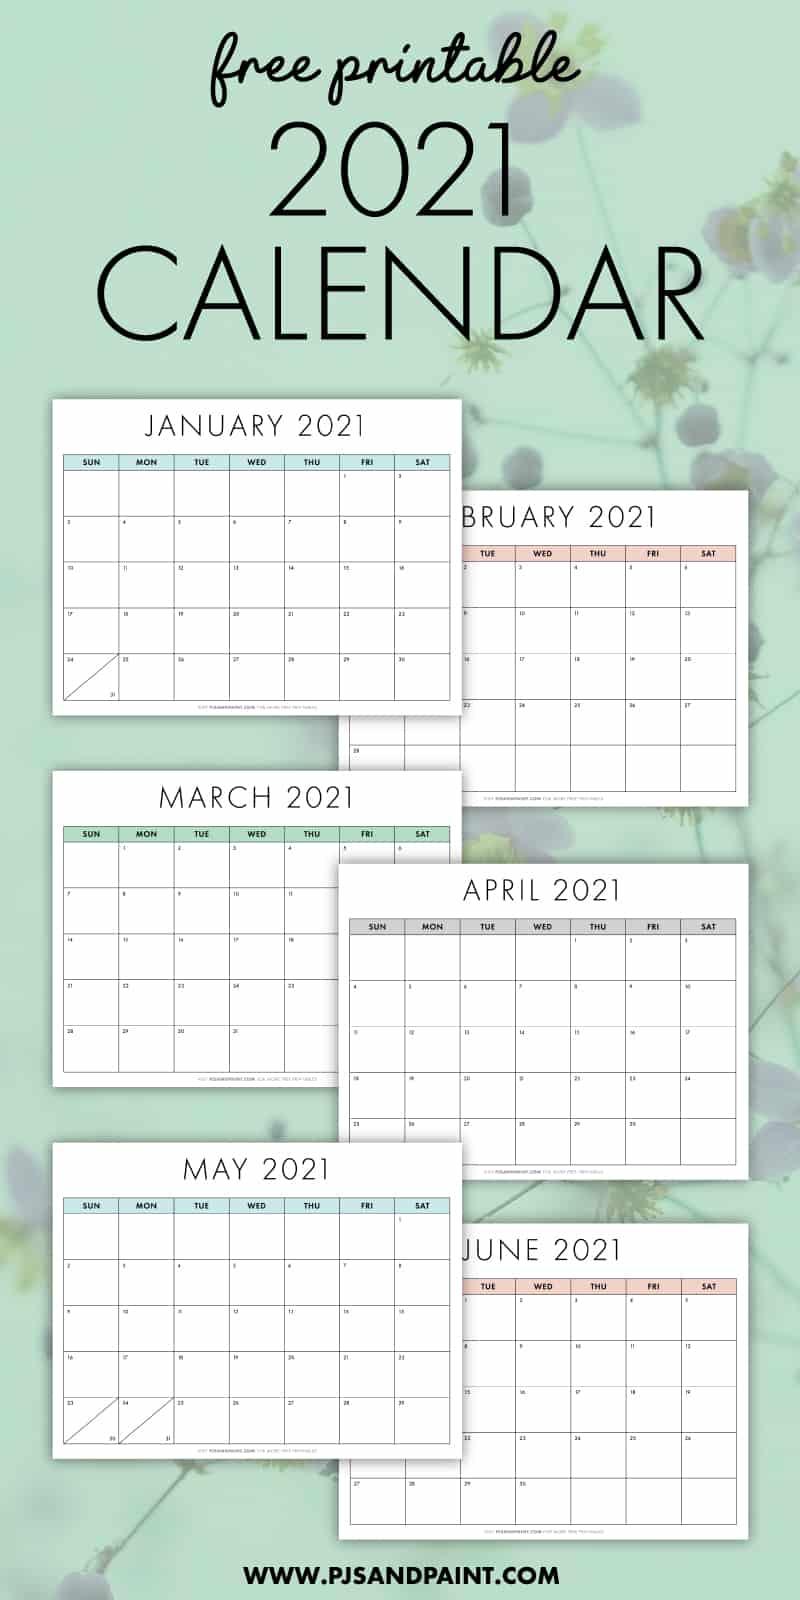 Free Printable 2021 Calendar – Sunday Start – Pjs And Paint Regarding Printable Sunrise And Sunset Calander 2021